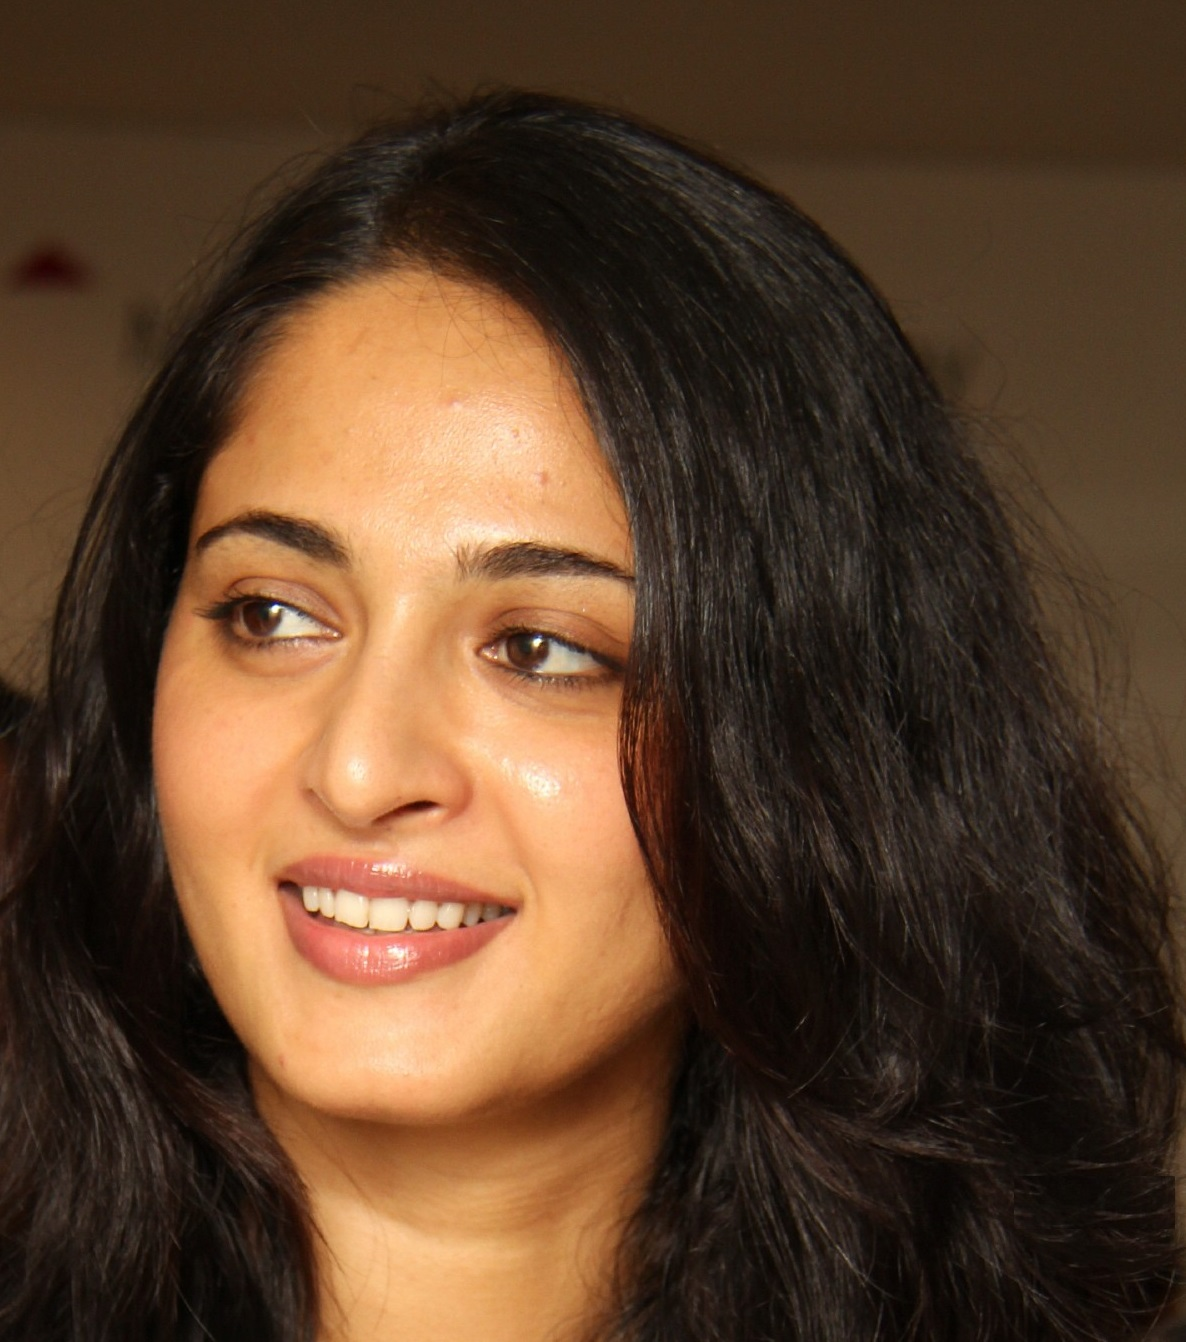 Anushka Shetty Gorgeous Face Close Up Stills